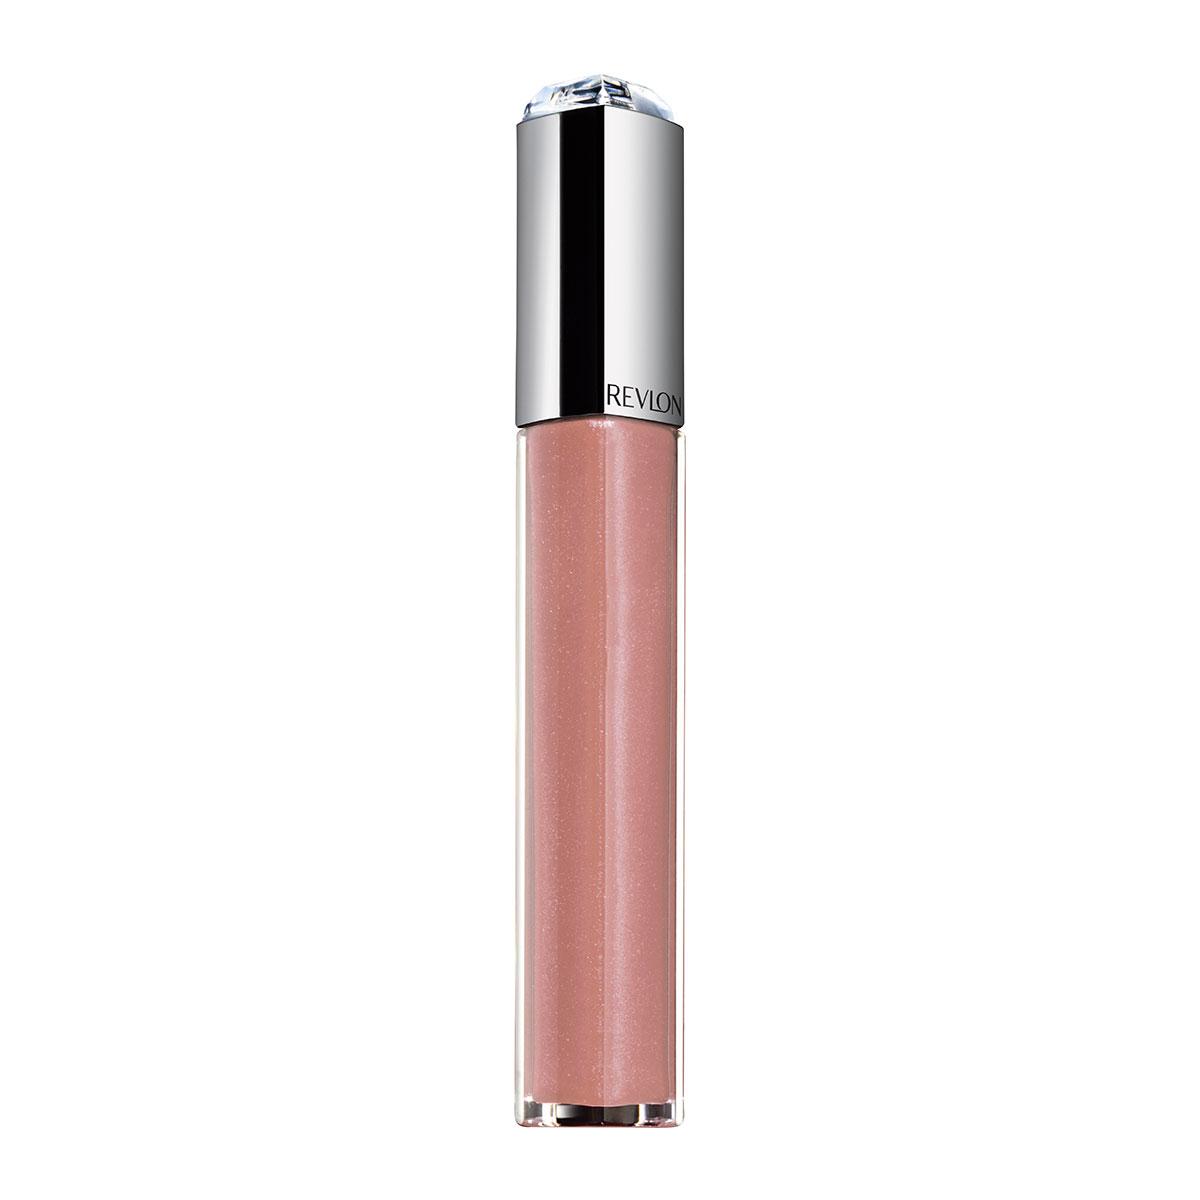 Revlon Помада-блеск для Губ Ultra Hd Lip Lacquer Smoky topaz 570 5, 9 мл